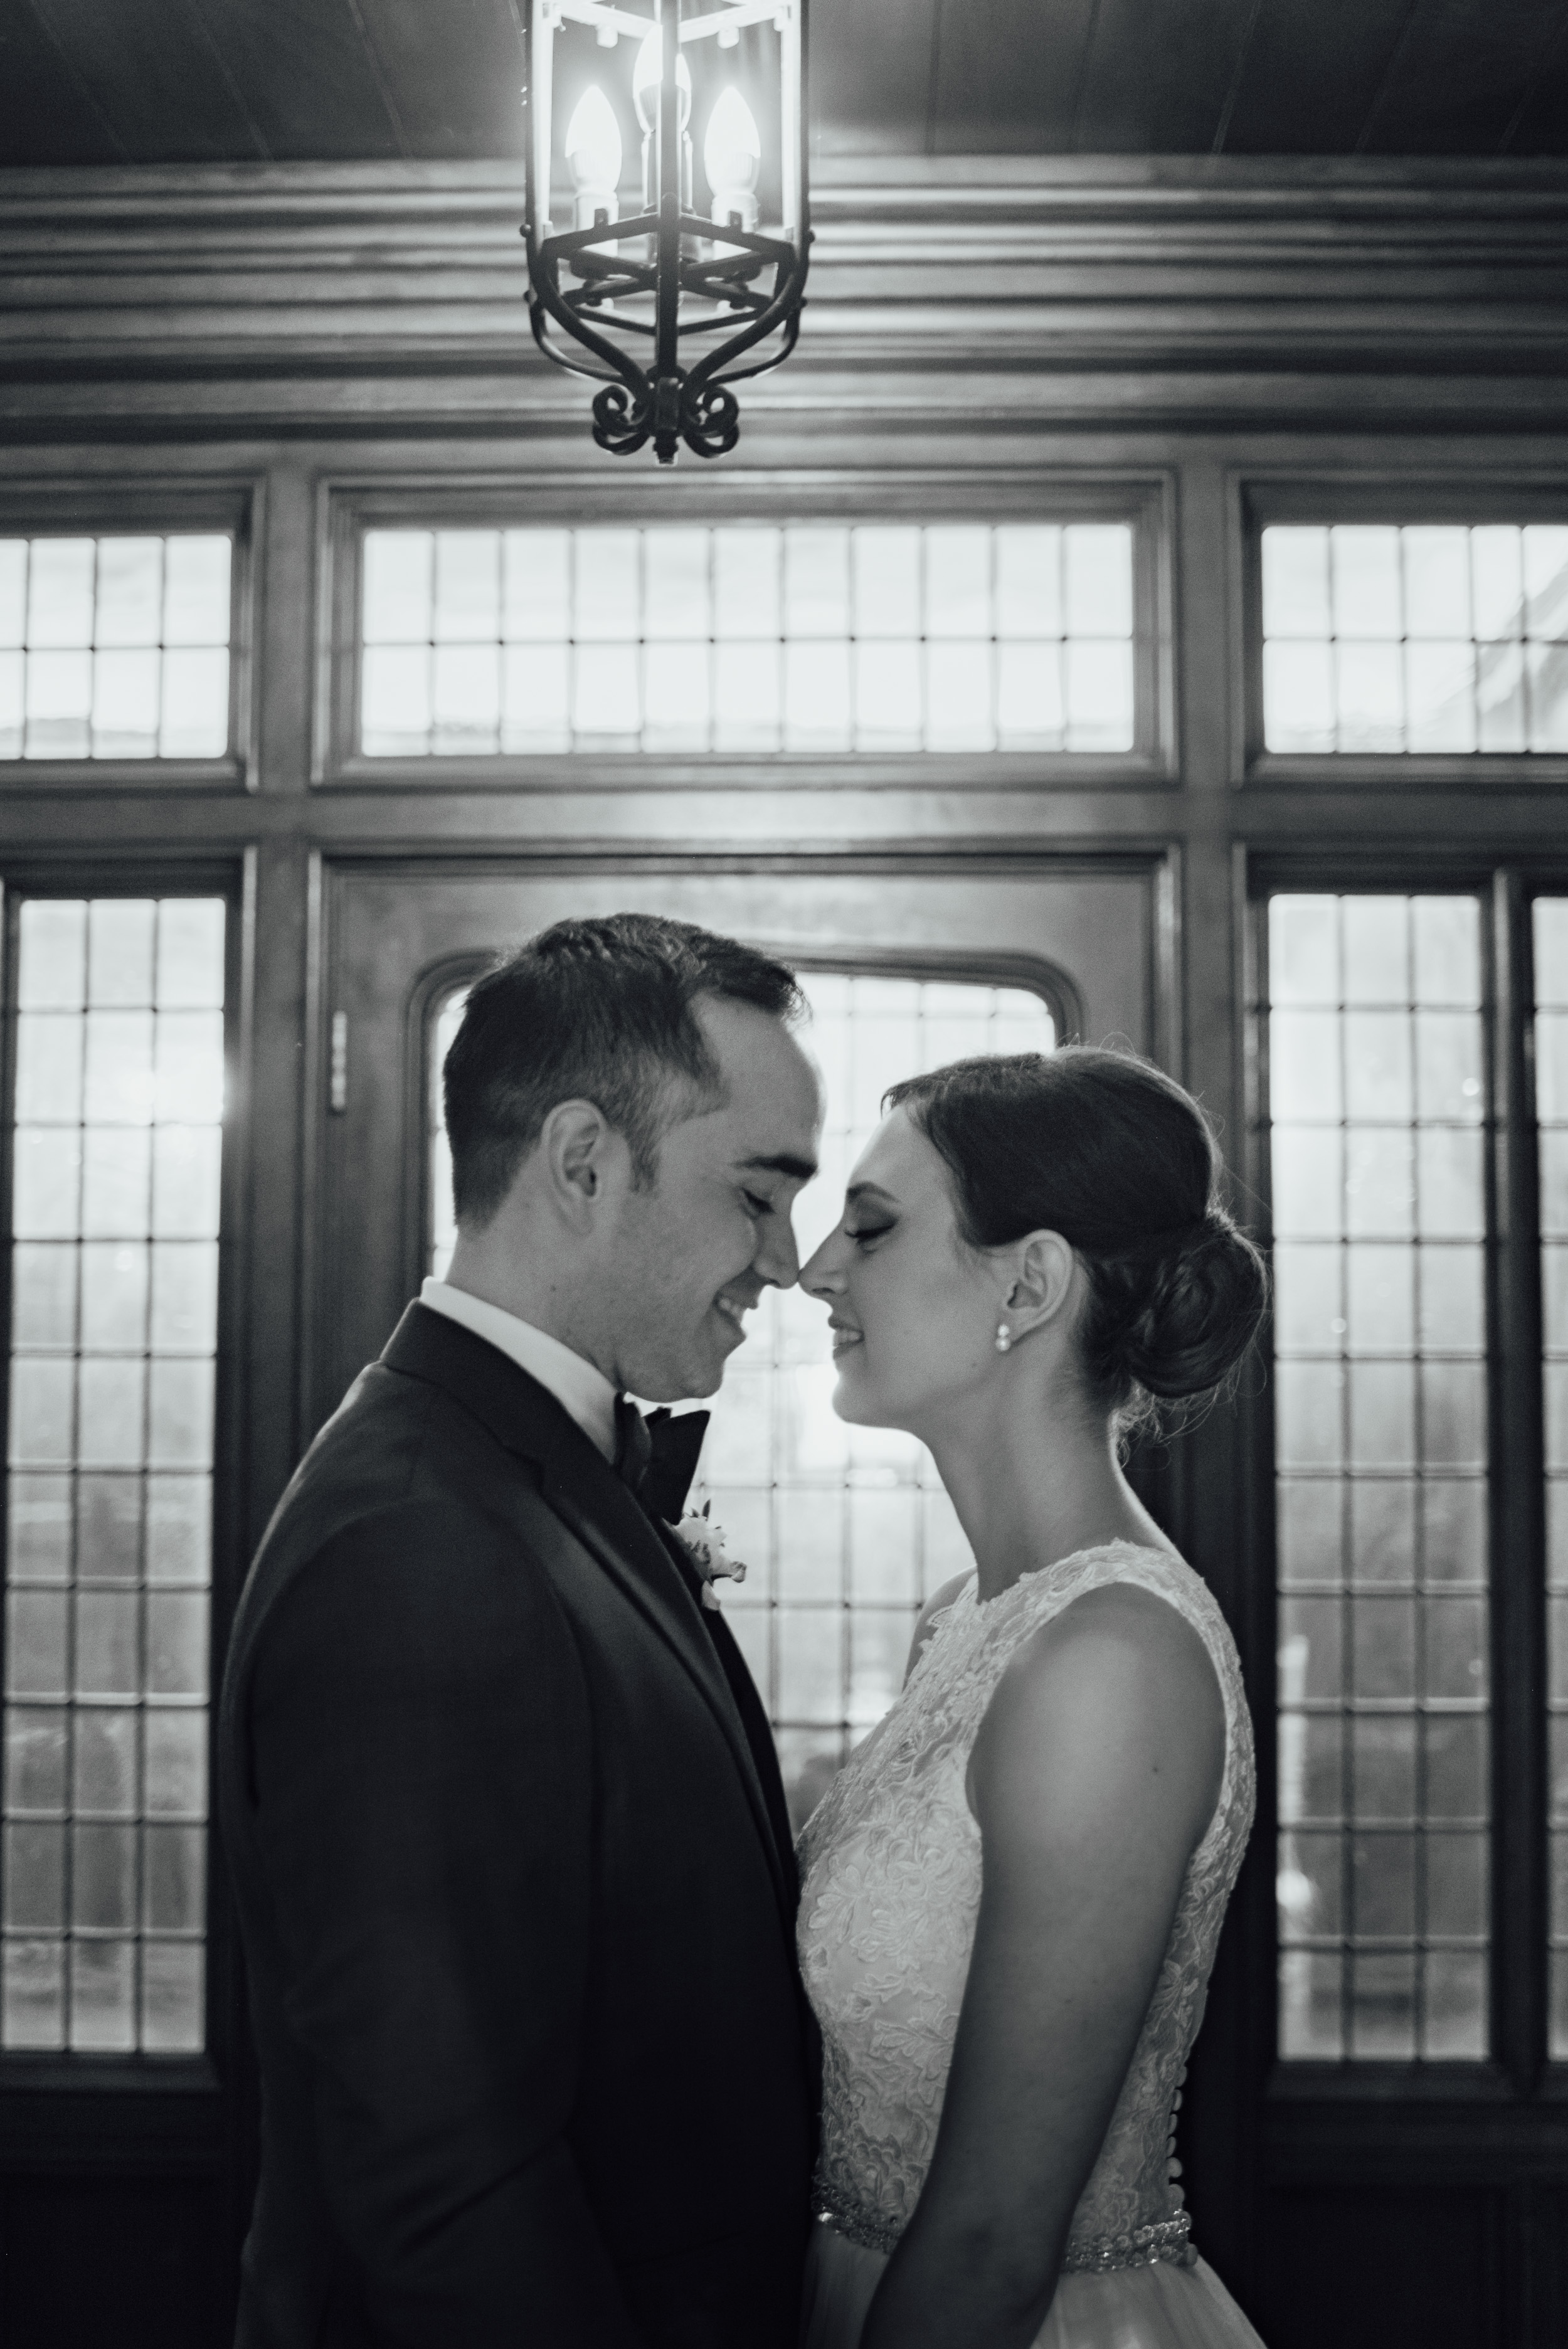 cleland-studios-wedding-photography-60.jpg